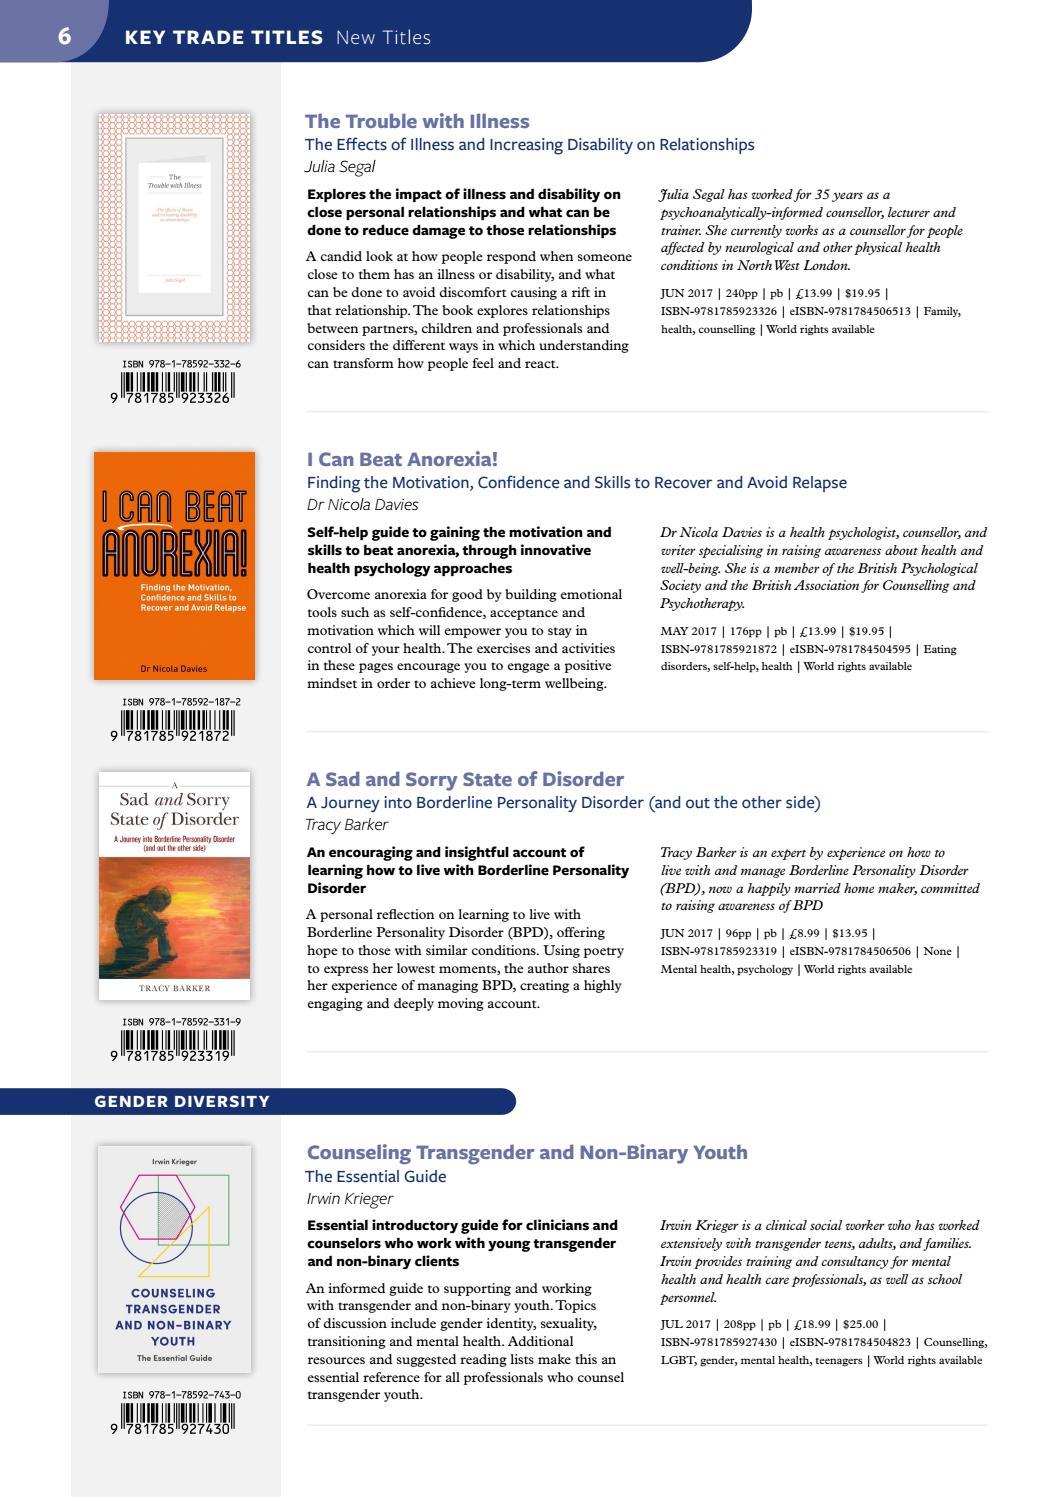 Jessica Kingsley Publishers - New Titles Catalogue Spring-Summer 2017 by  Jessica Kingsley Publishers - issuu